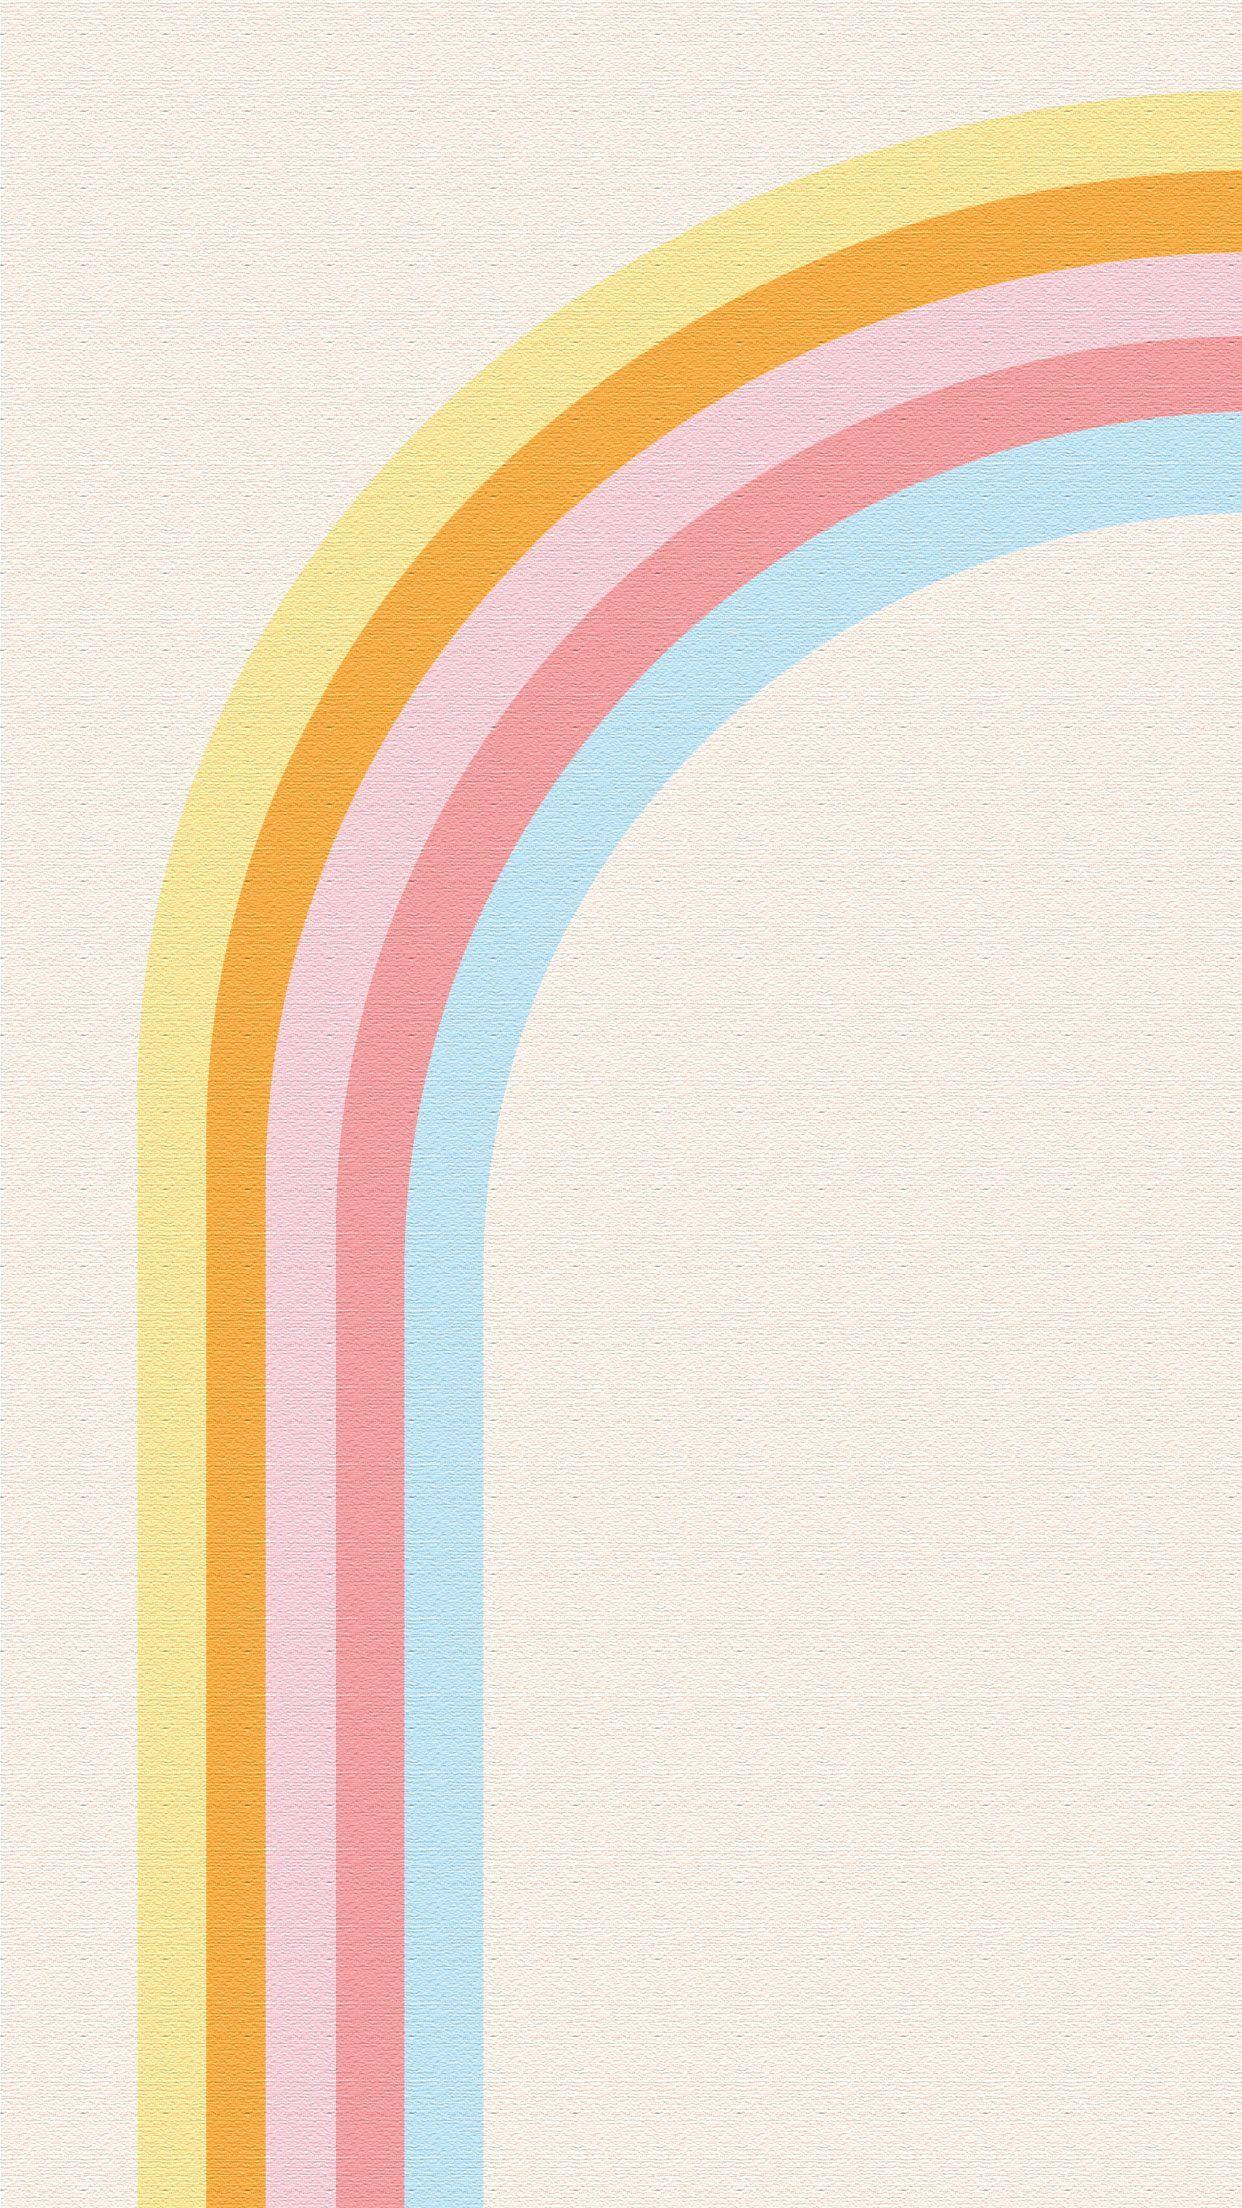 The Best 20 Iphone Retro 20S Aesthetic Background ...